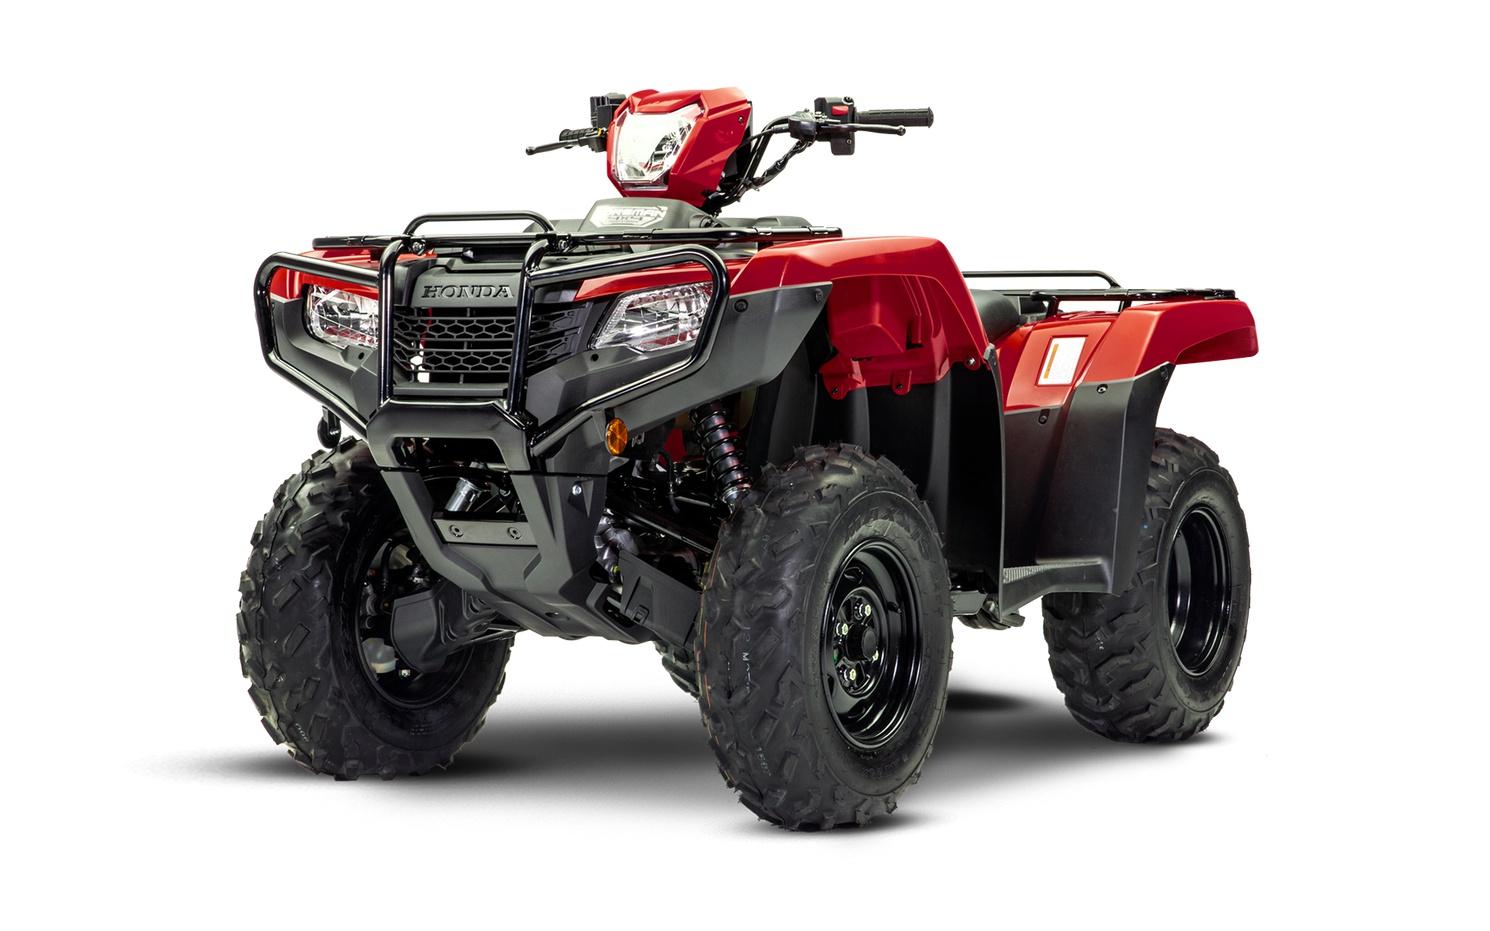 Honda foreman 520 2021 - trx520fm1m